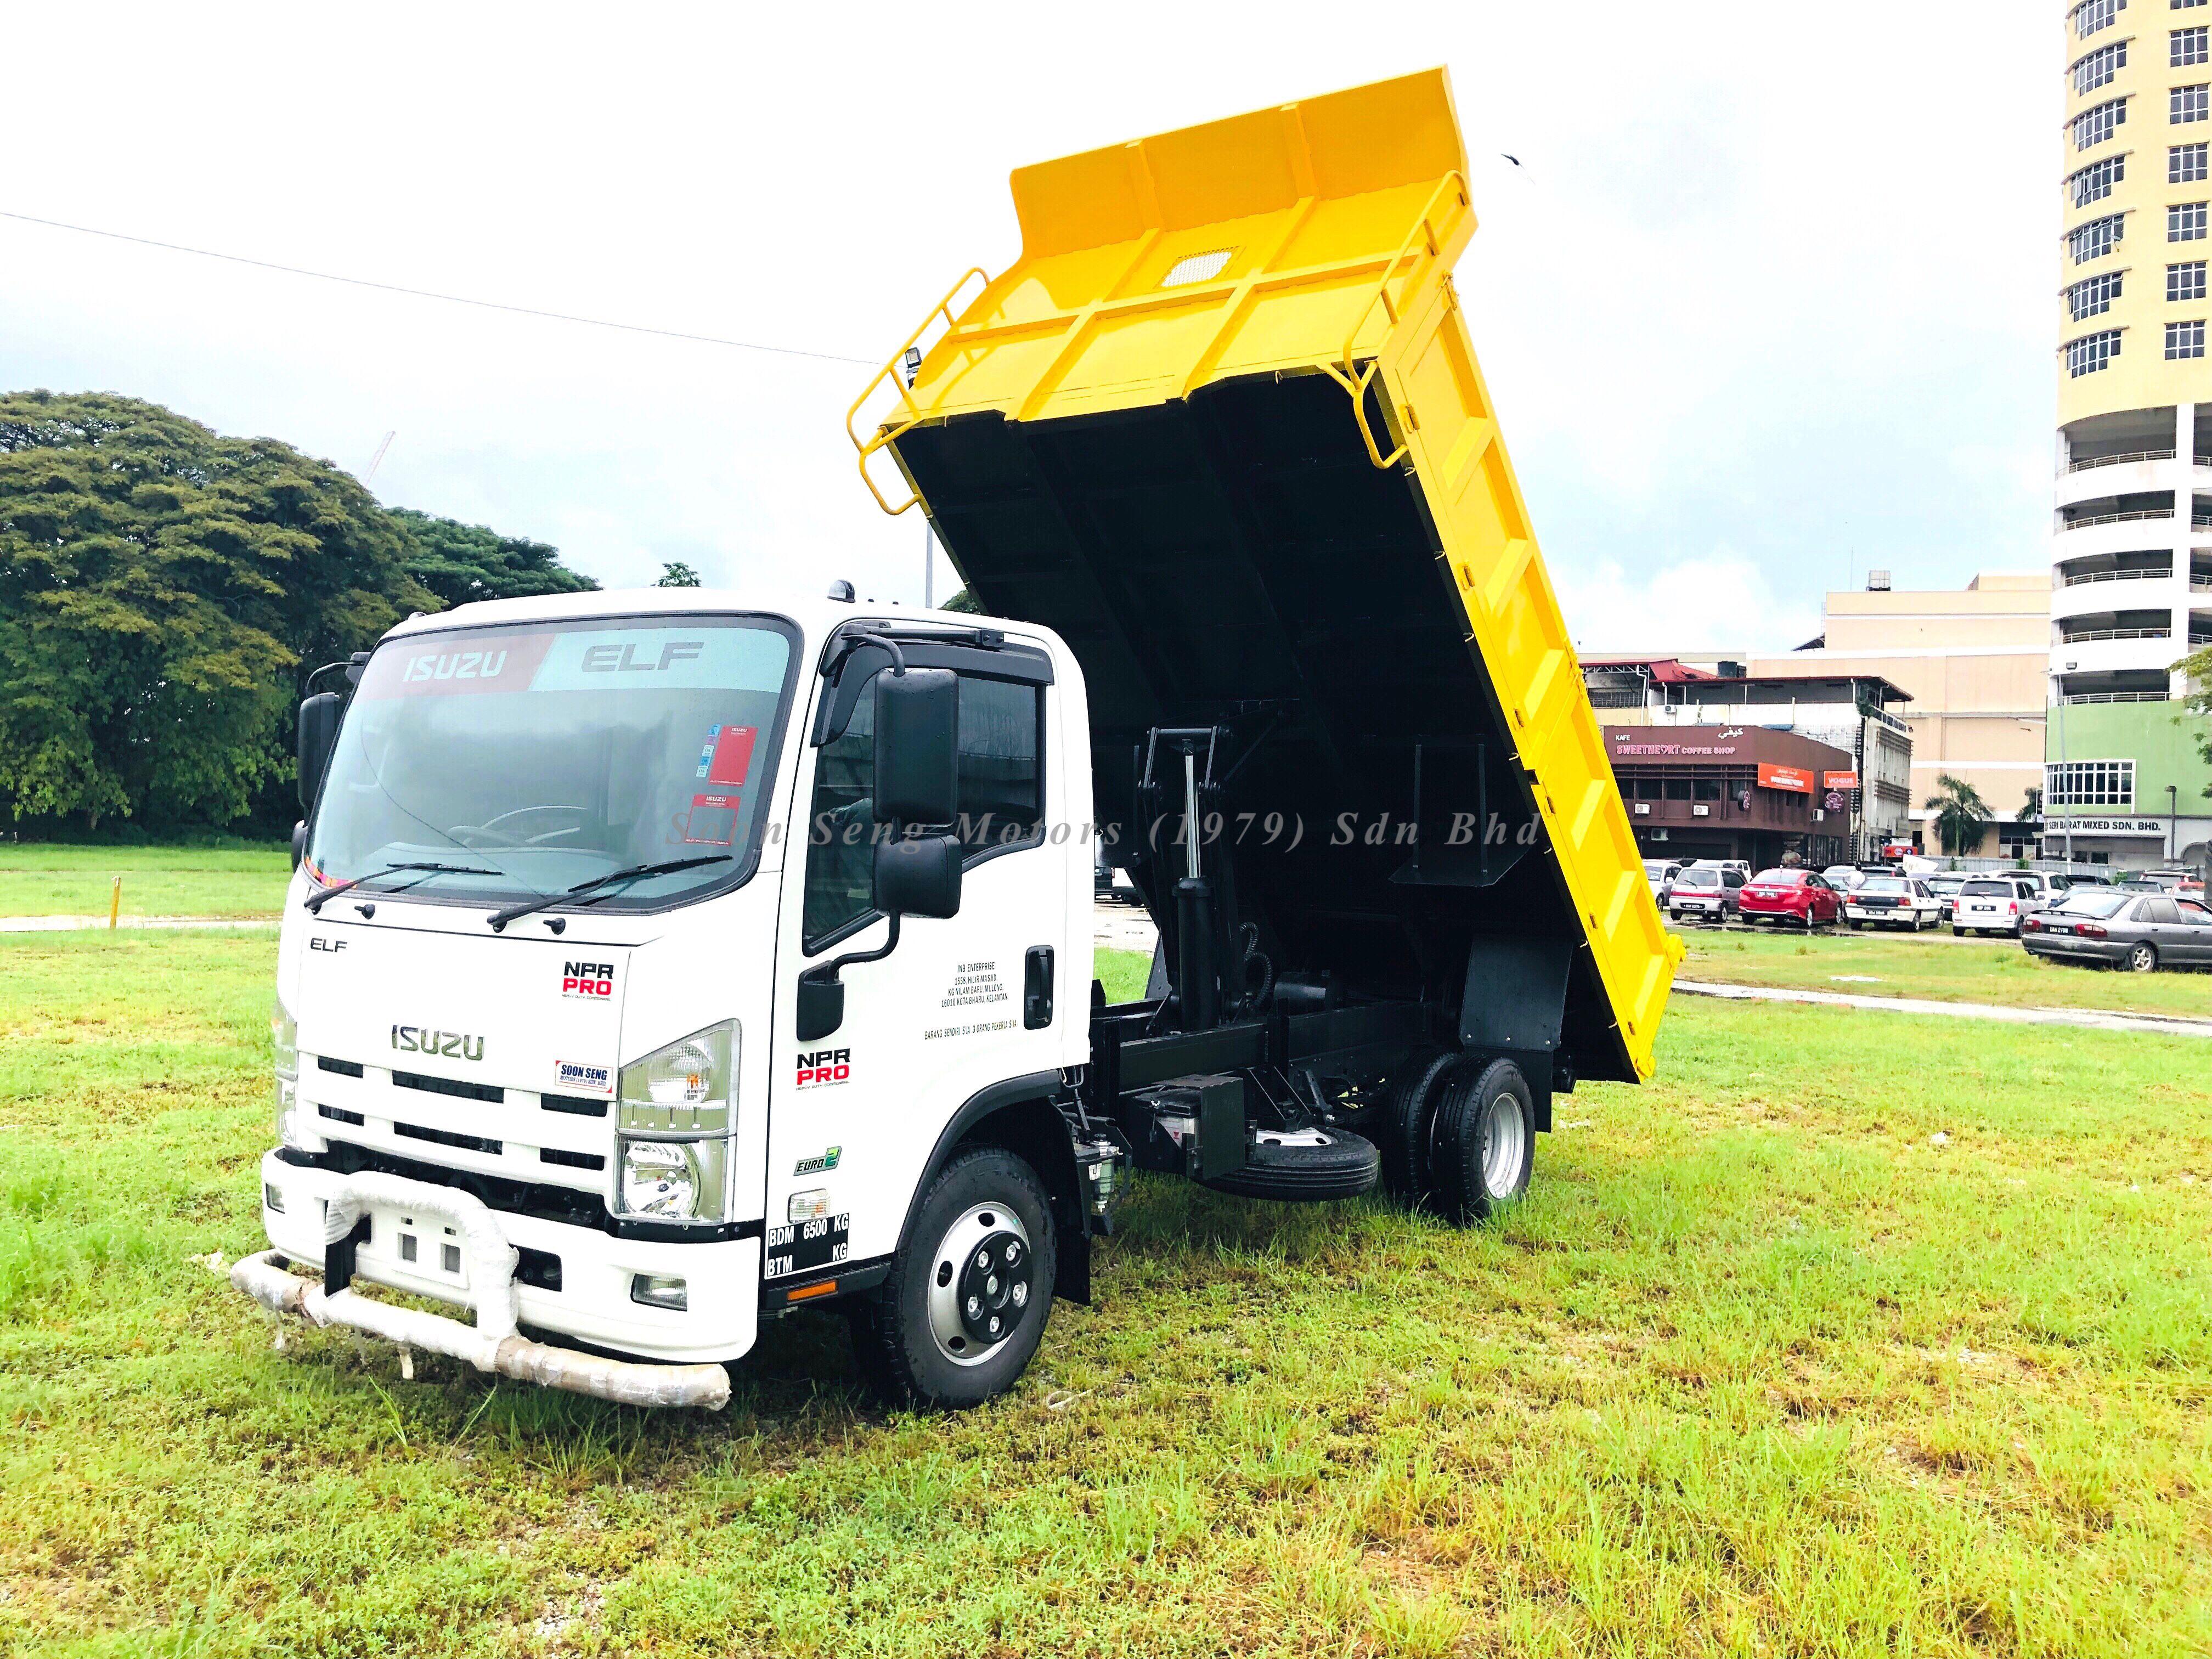 Isuzu Npr Pro Dumper Truck Dumper Truck Trucks Trucks For Sale